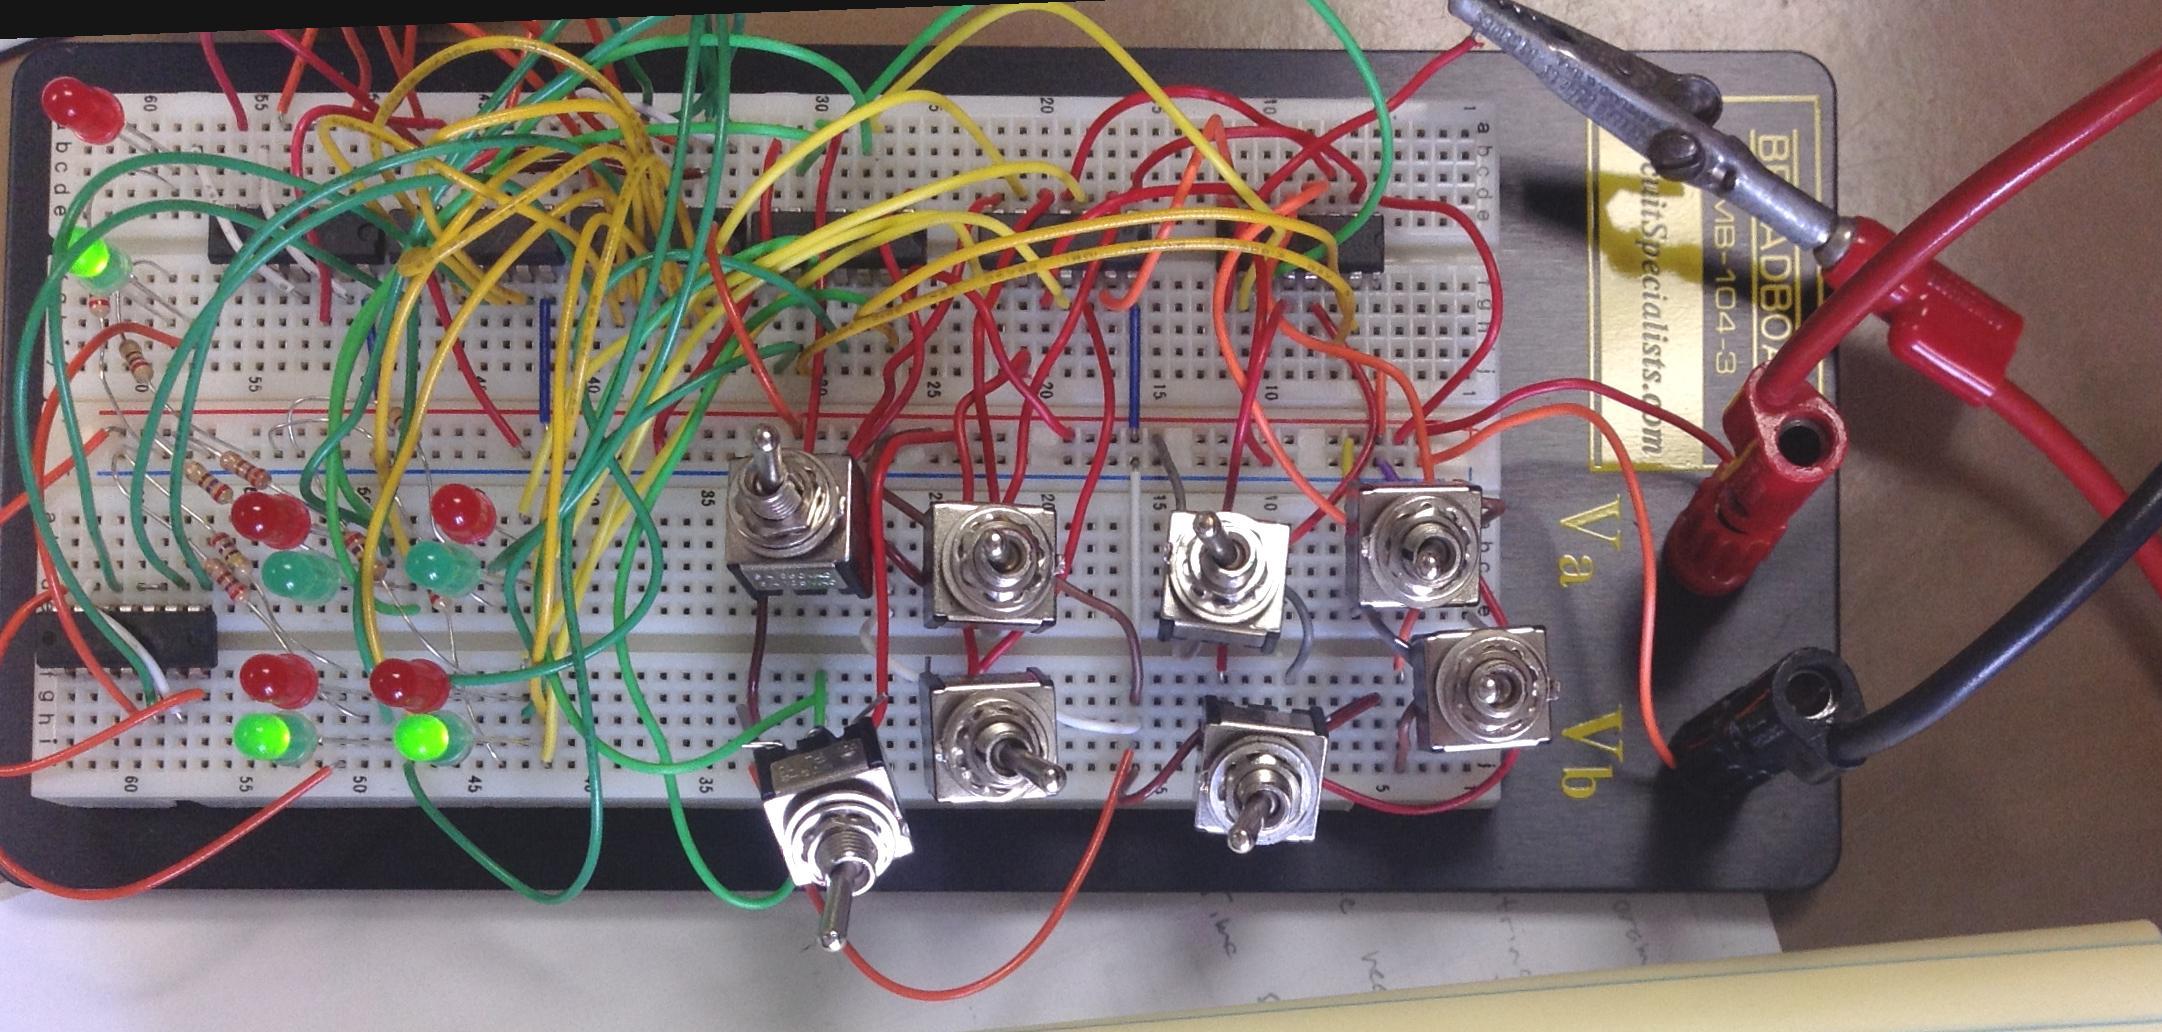 029128 Electronics Phys3850 Electronic Game Circuit Diagram Tic Tac Toe